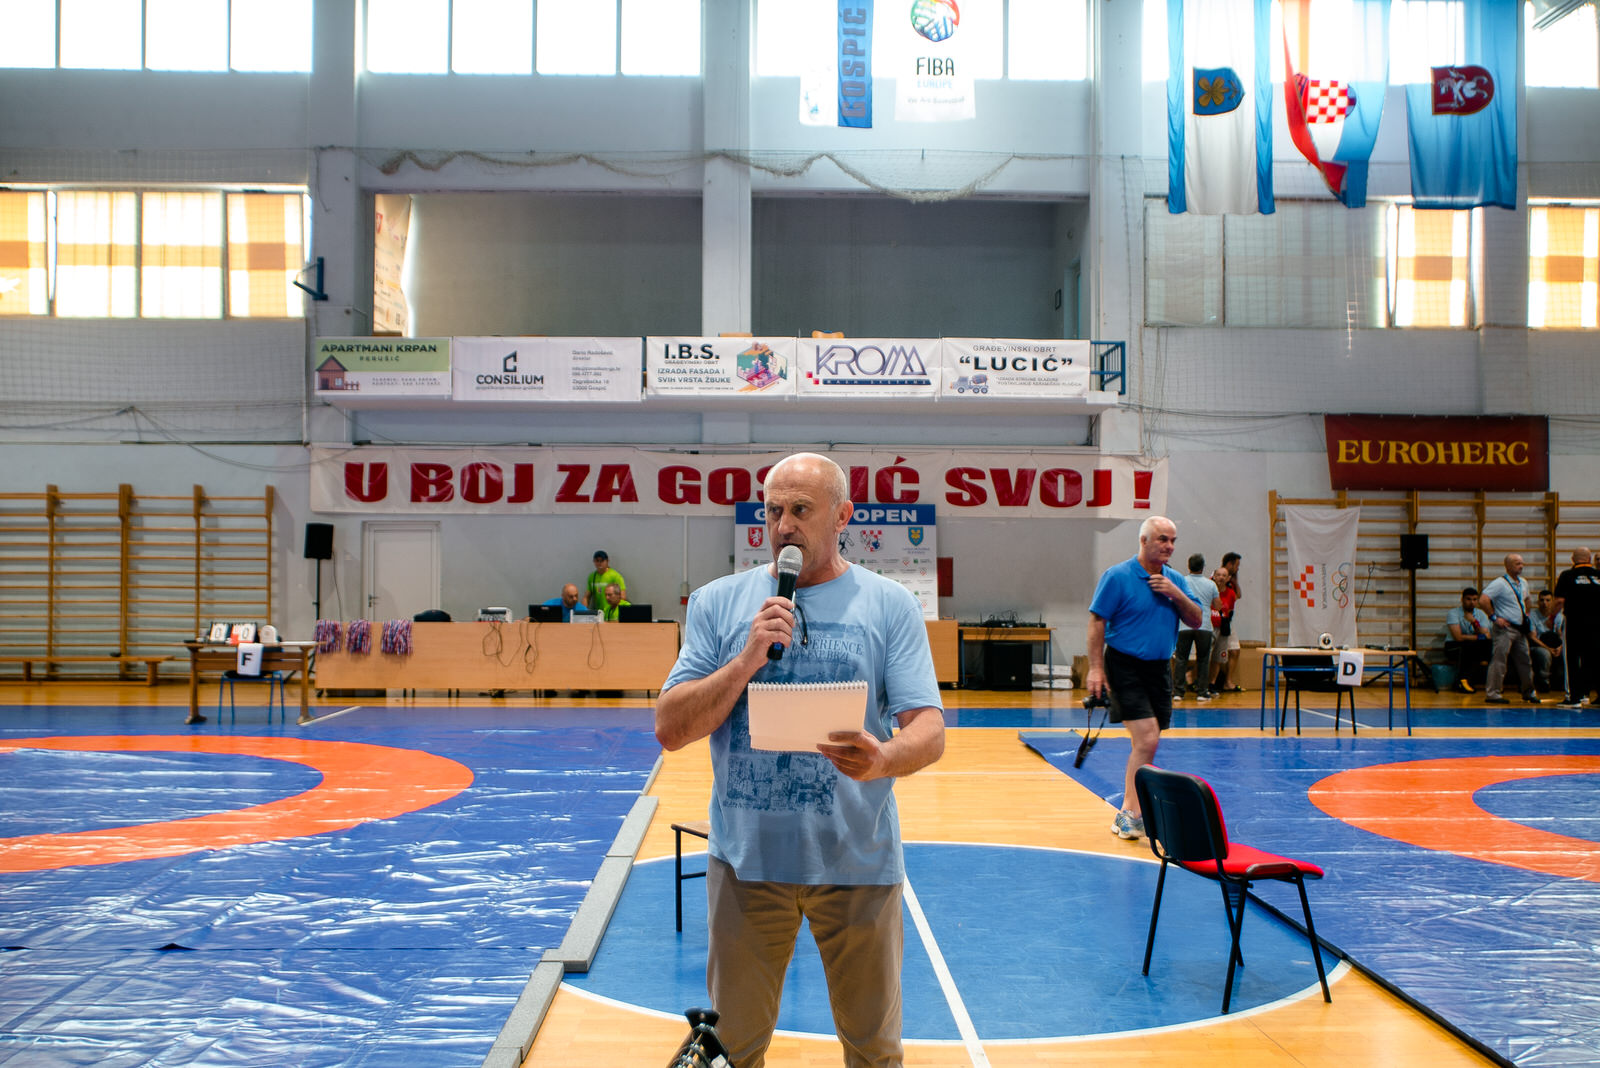 likaclub_gospić-open-hrvanje_2019-22